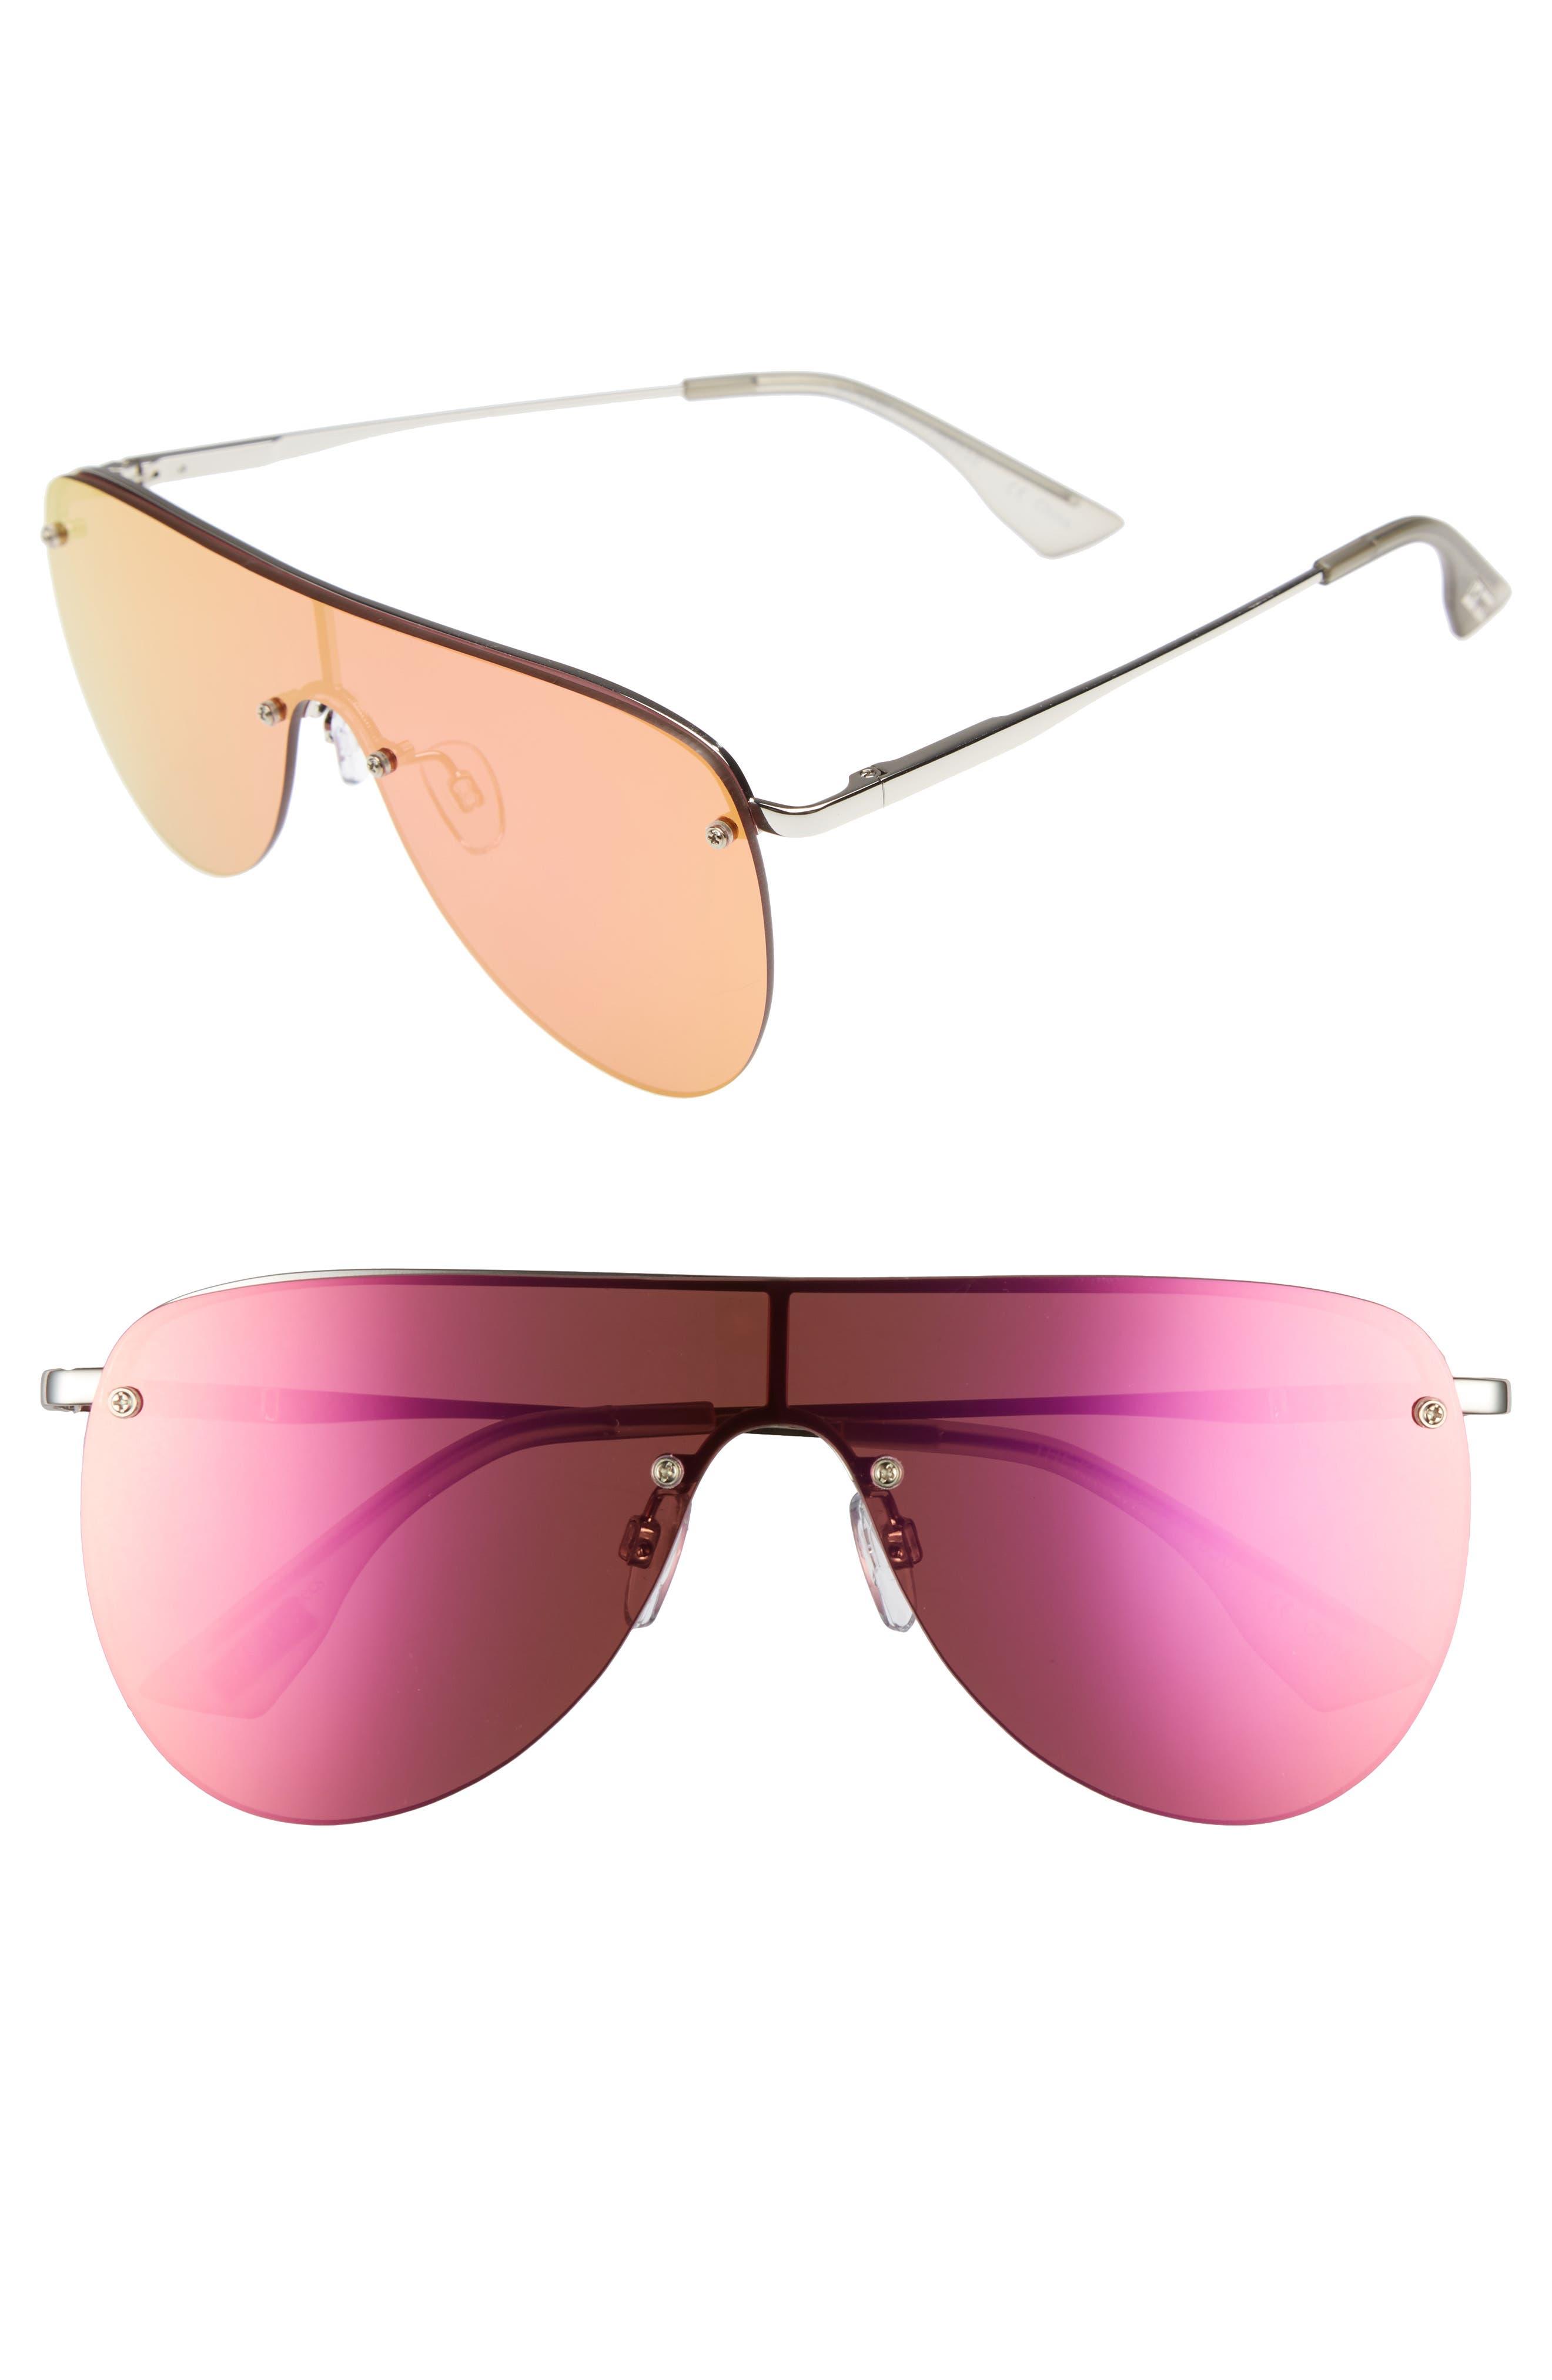 Le Specs The King 58mm Shield Sunglasses